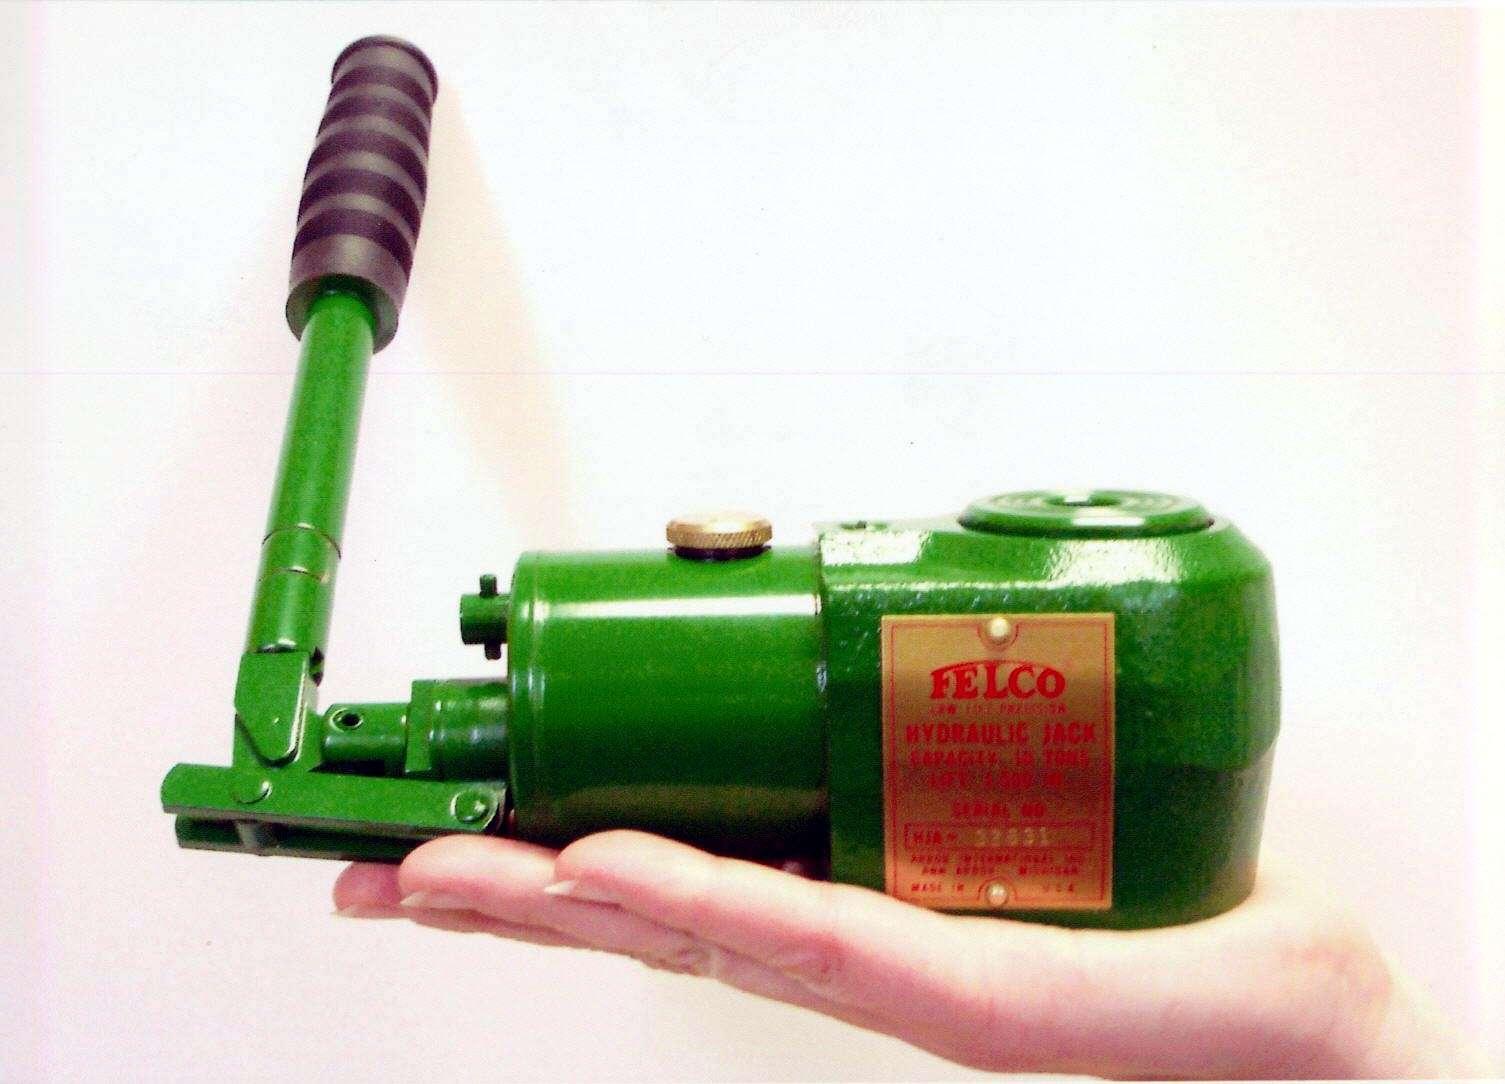 Hydraulic Lifting Equipment: lifting jacks, bags, wedges Enerpac